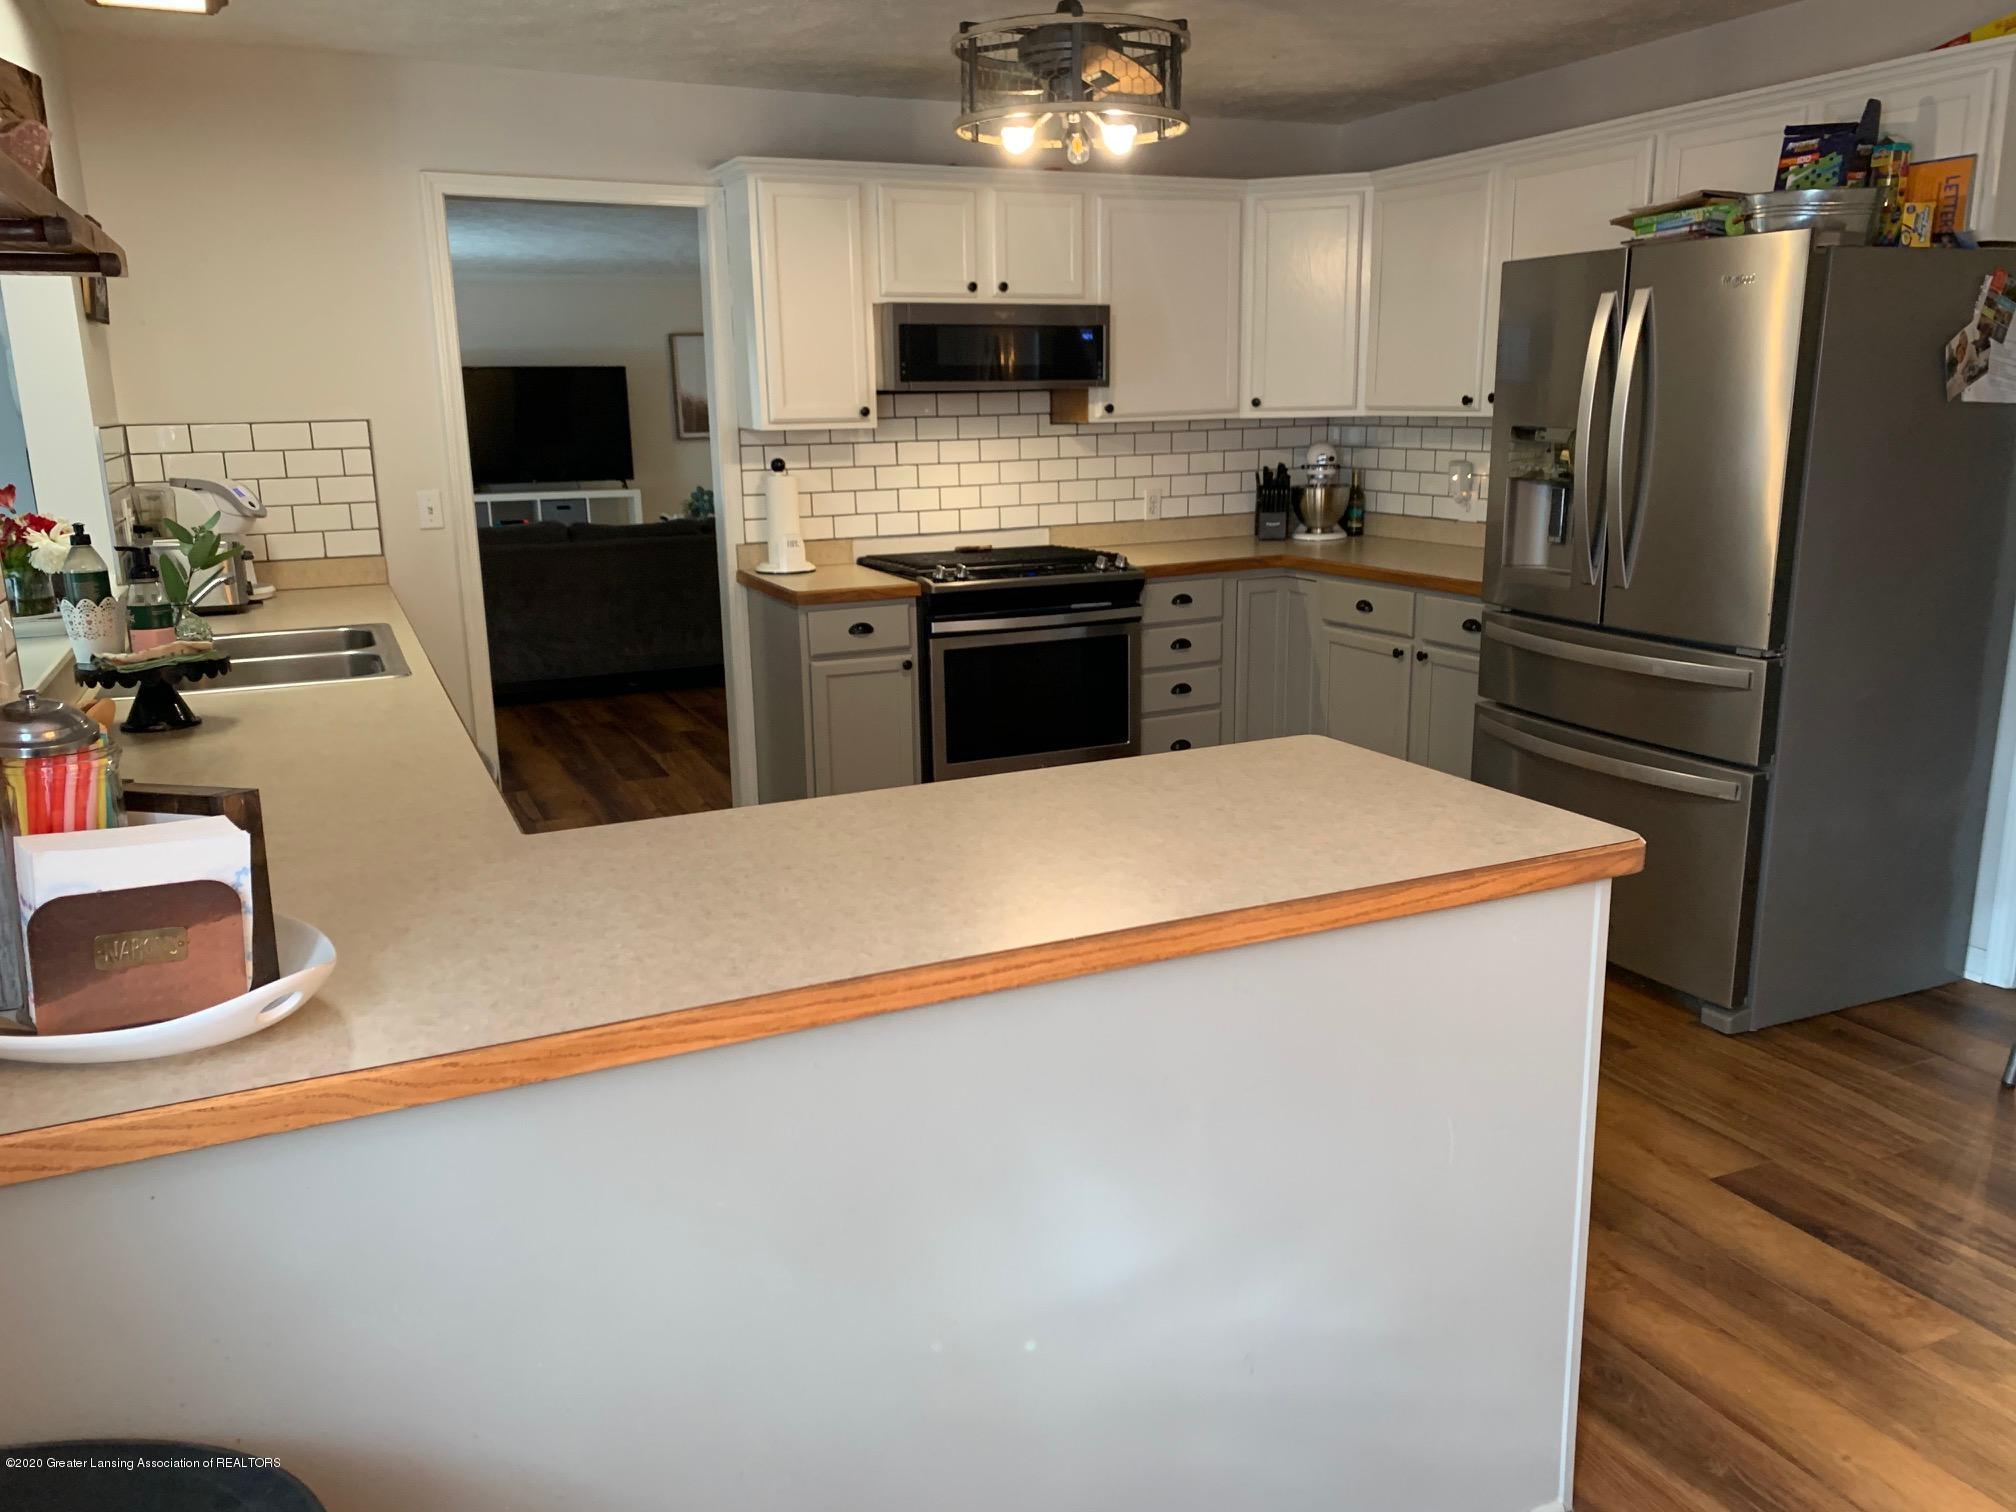 2096 S Perkey Rd - Kitchen - 10